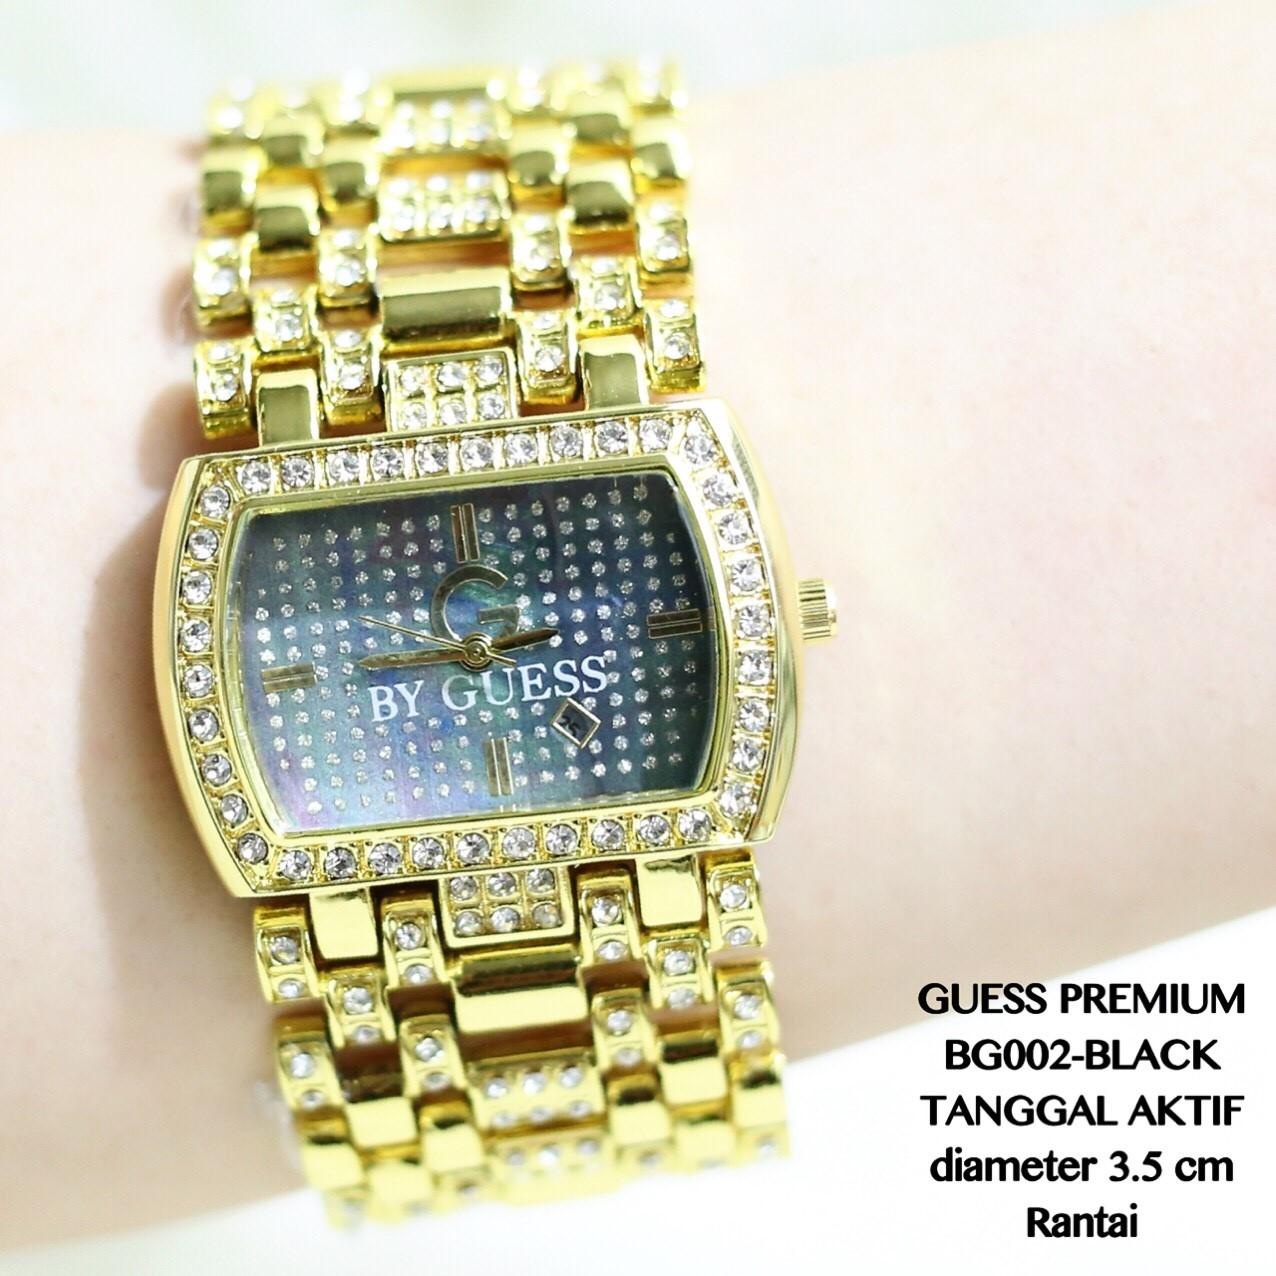 Jam tangan guess premium rantai gold spiral supplier grosir termurah